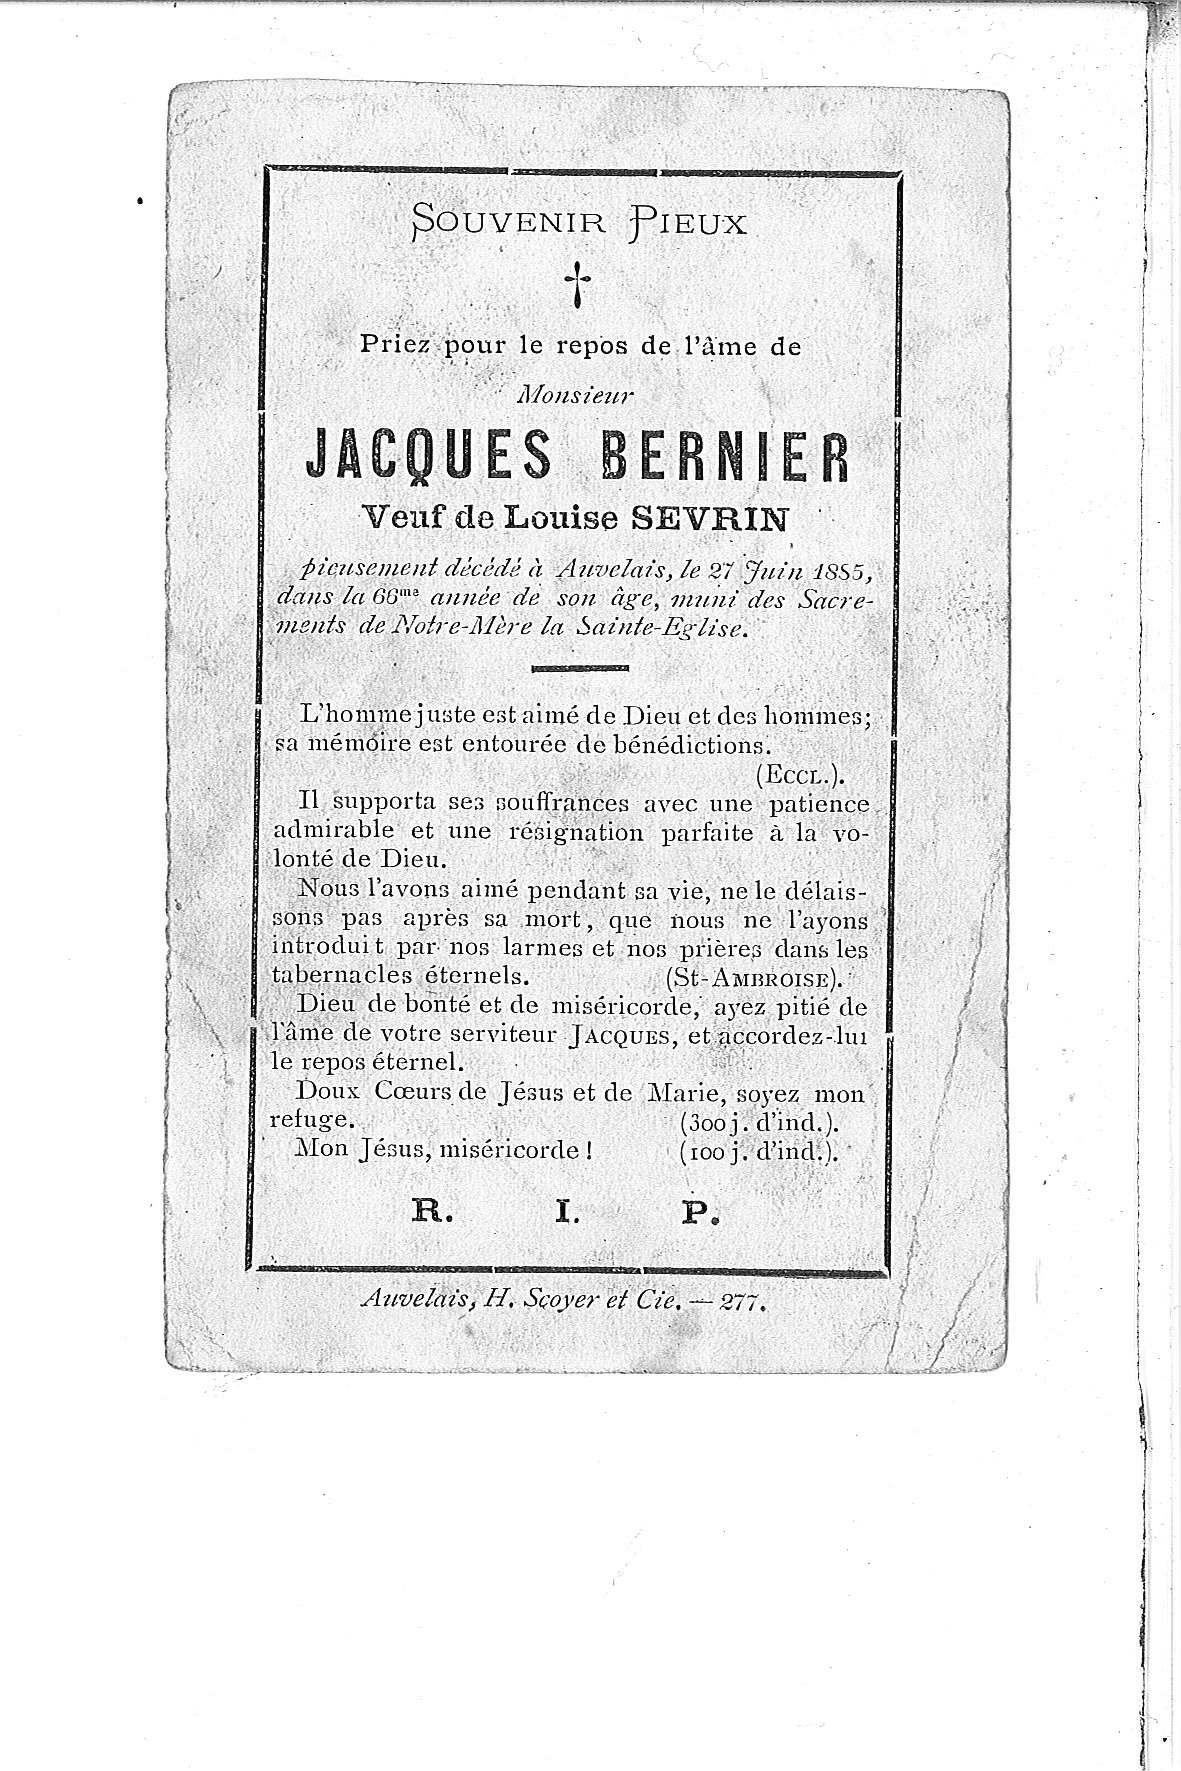 Jacques(1885)20110114142811_00025.jpg